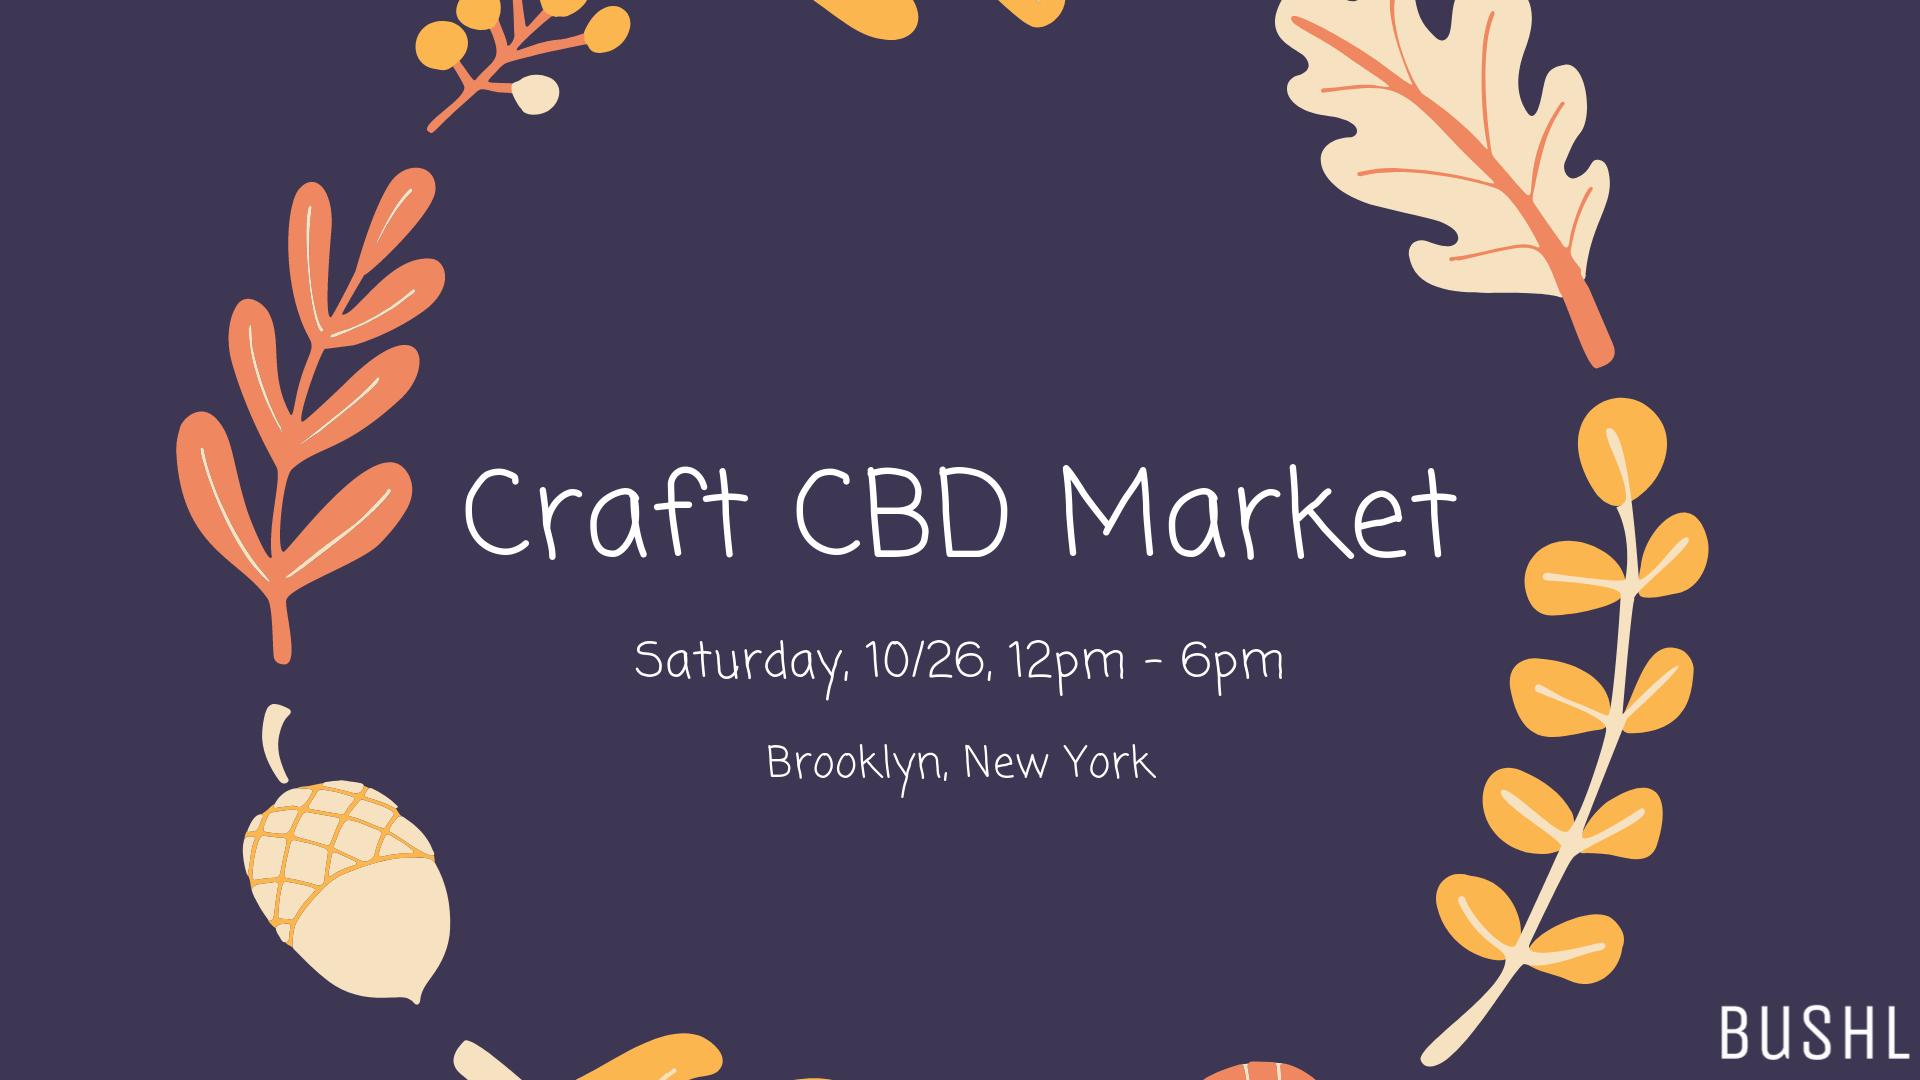 Craft CBD Market